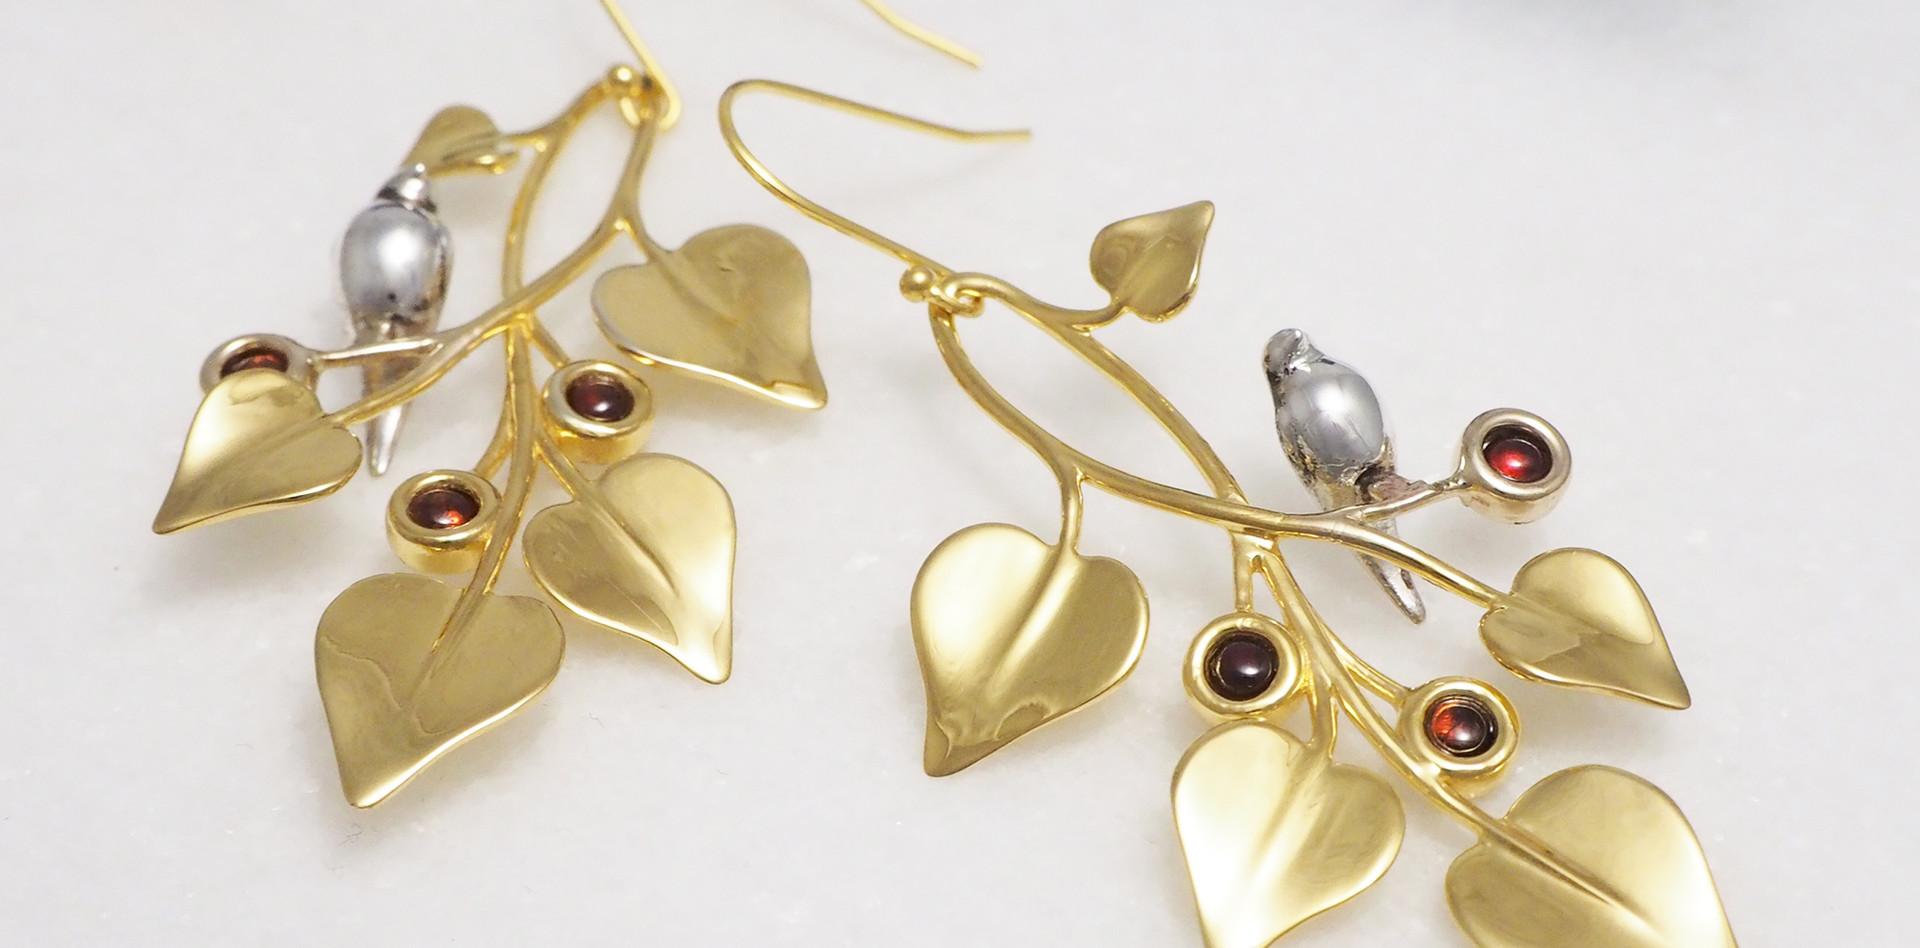 Doves in Draping Vines, Earrings-on marble